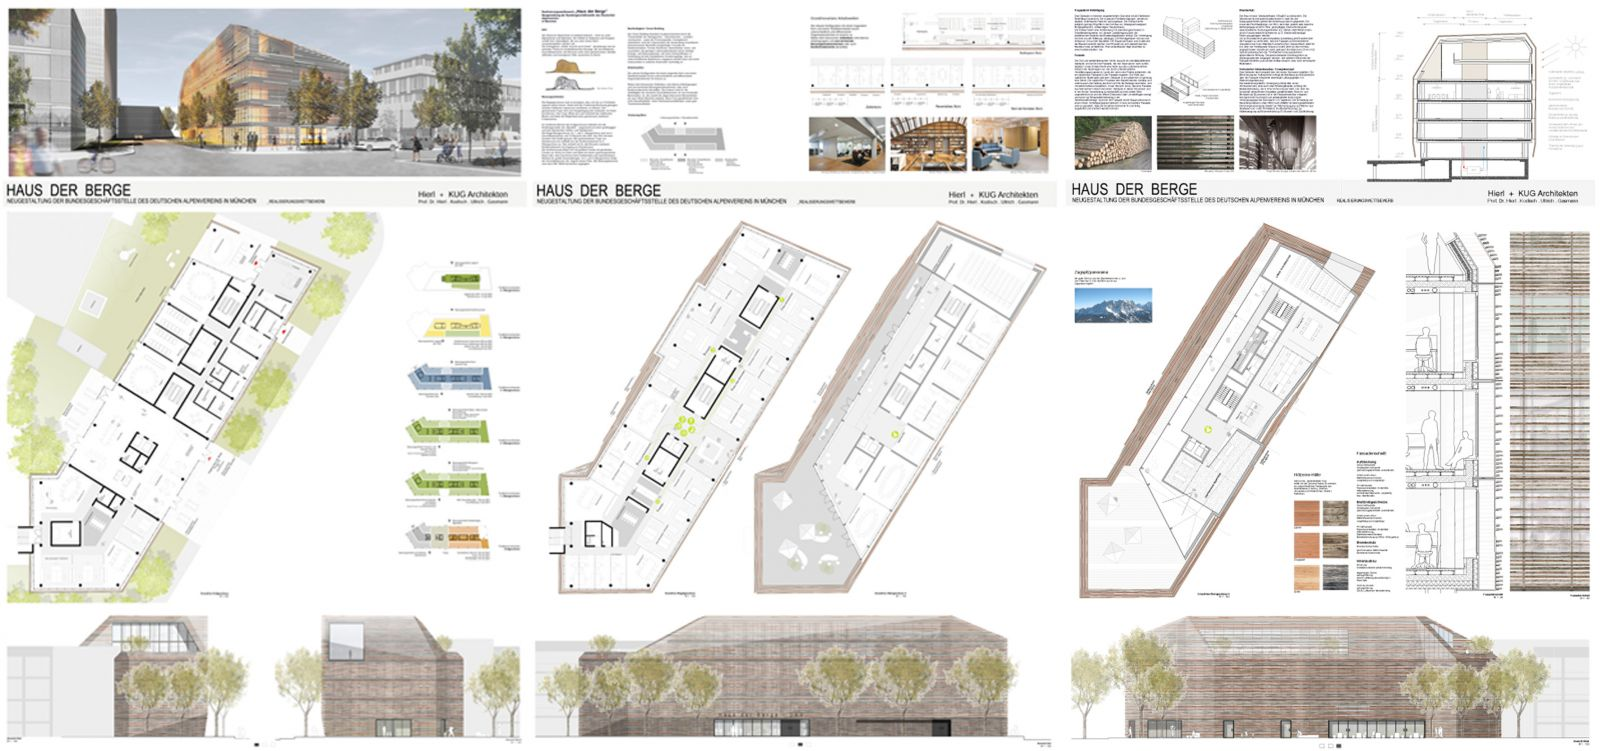 layouts1,2,3